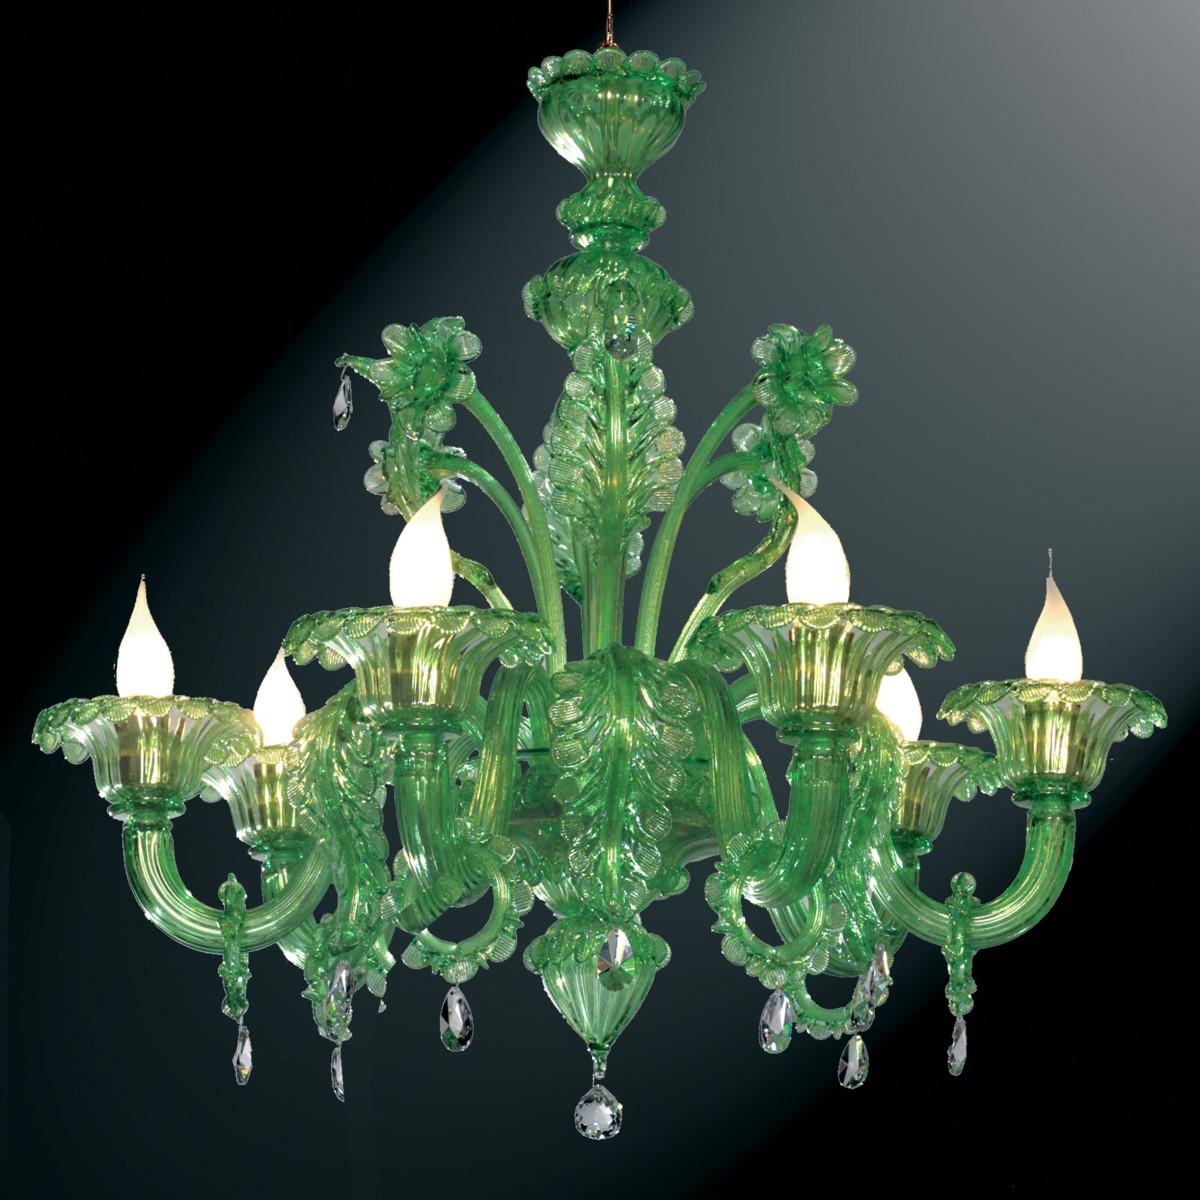 """Giada"" grüne Murano glas Kronleuchter - 6 flammig"